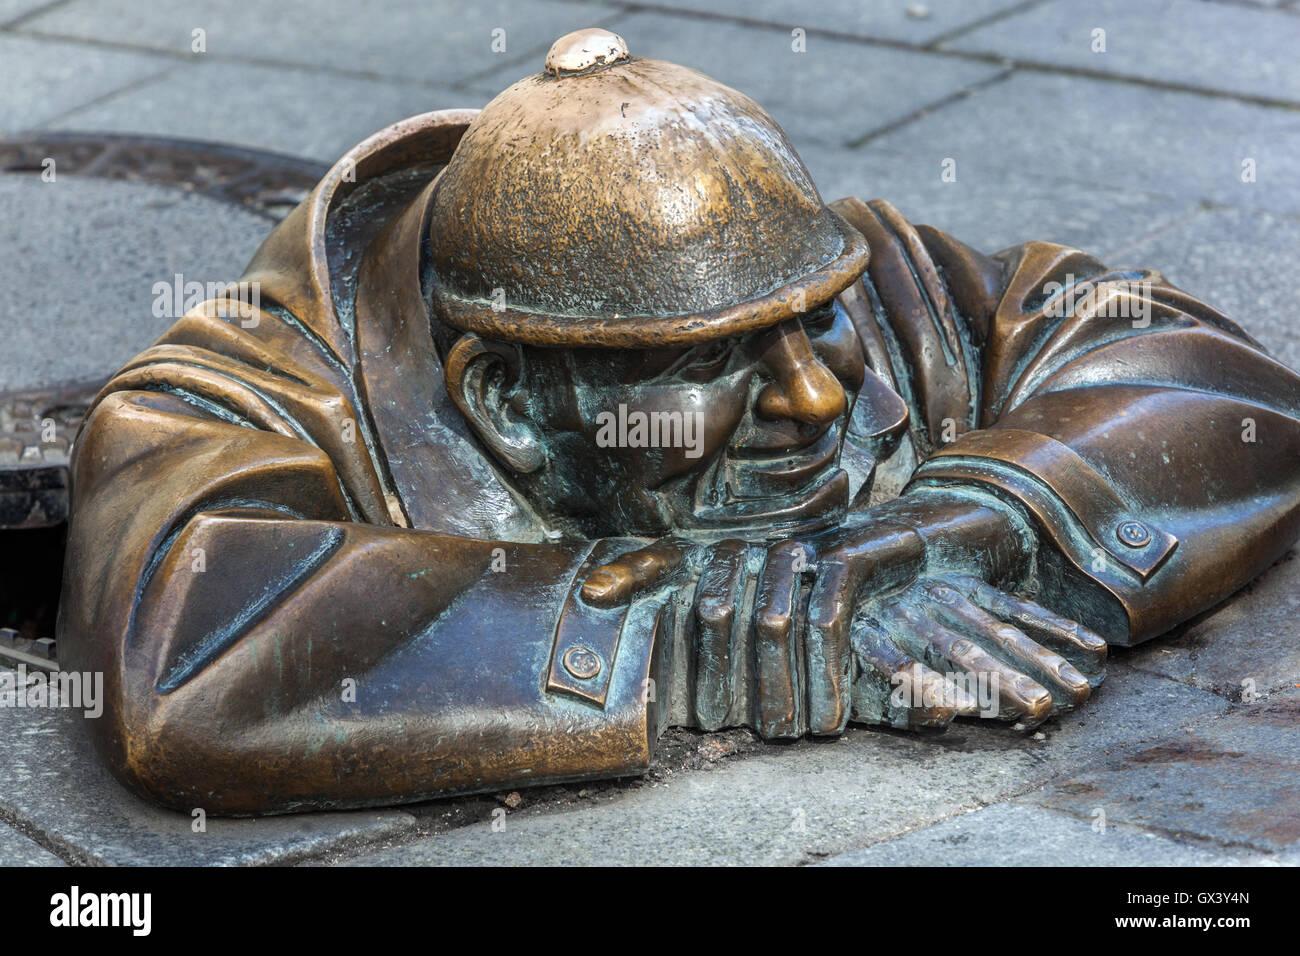 Canal worker statue by Viktor Hulik, Sculpture on the sidewalk, Art, Laurinska Street, Old Town street, Bratislava, - Stock Image